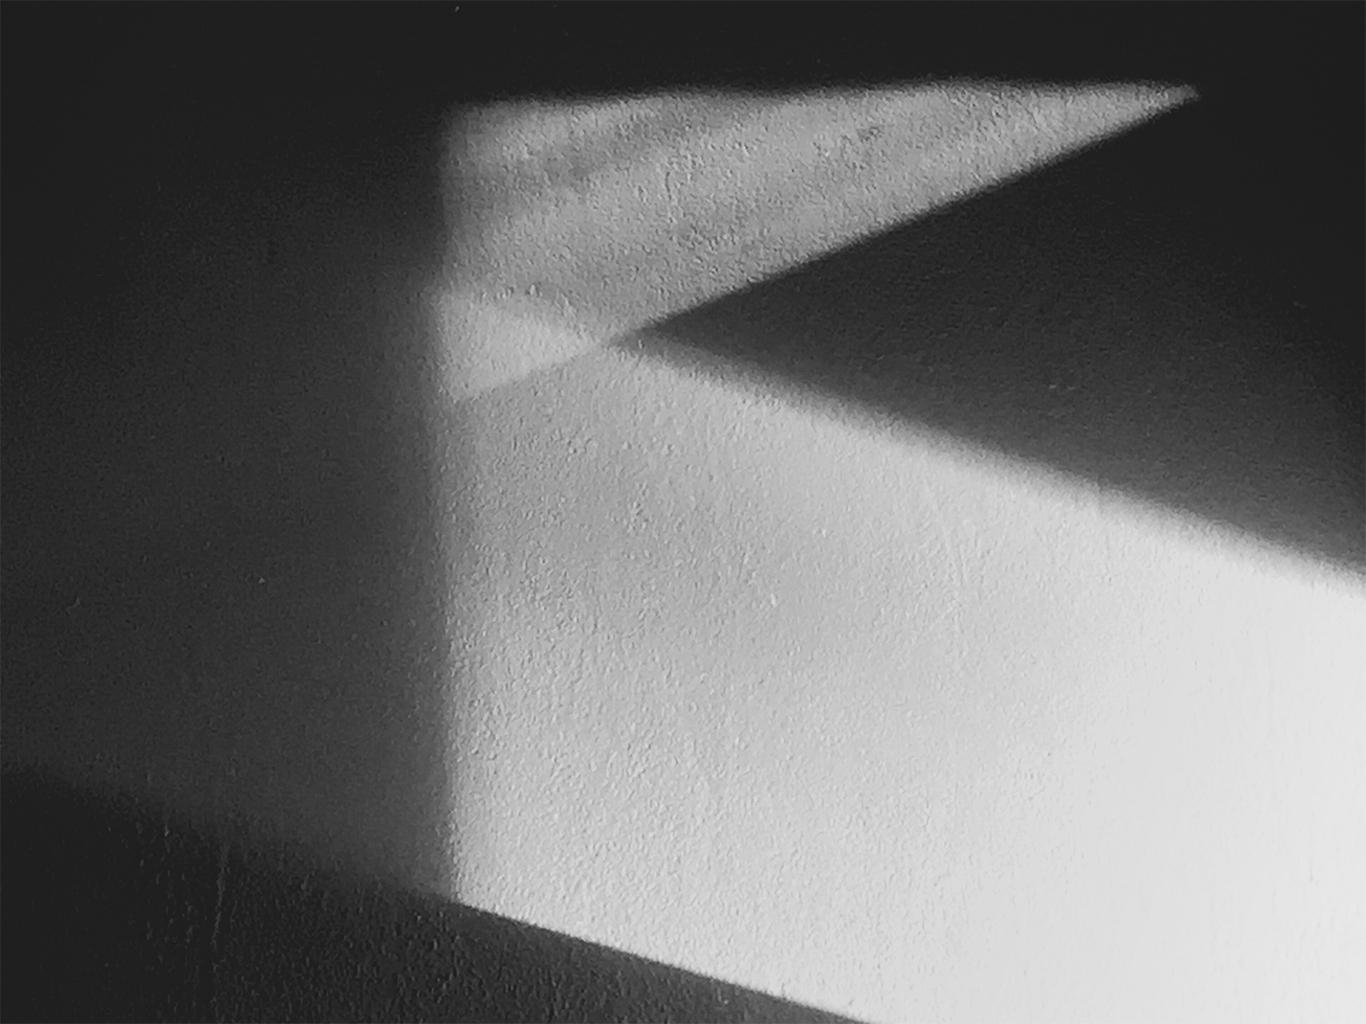 BMJ_Search_Light